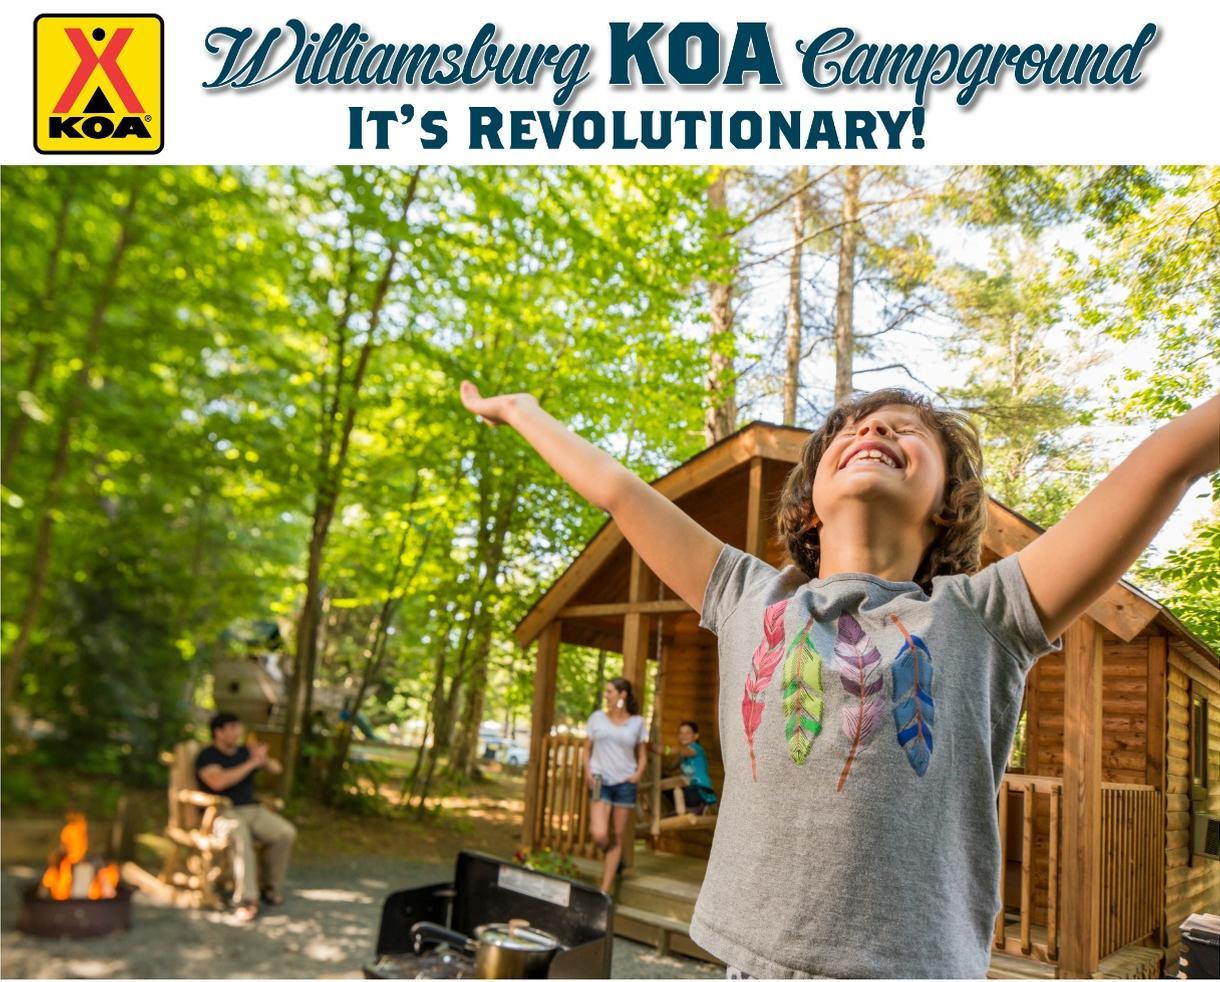 Williamsburg KOA 2-Night Cabin or Campsite Getaway